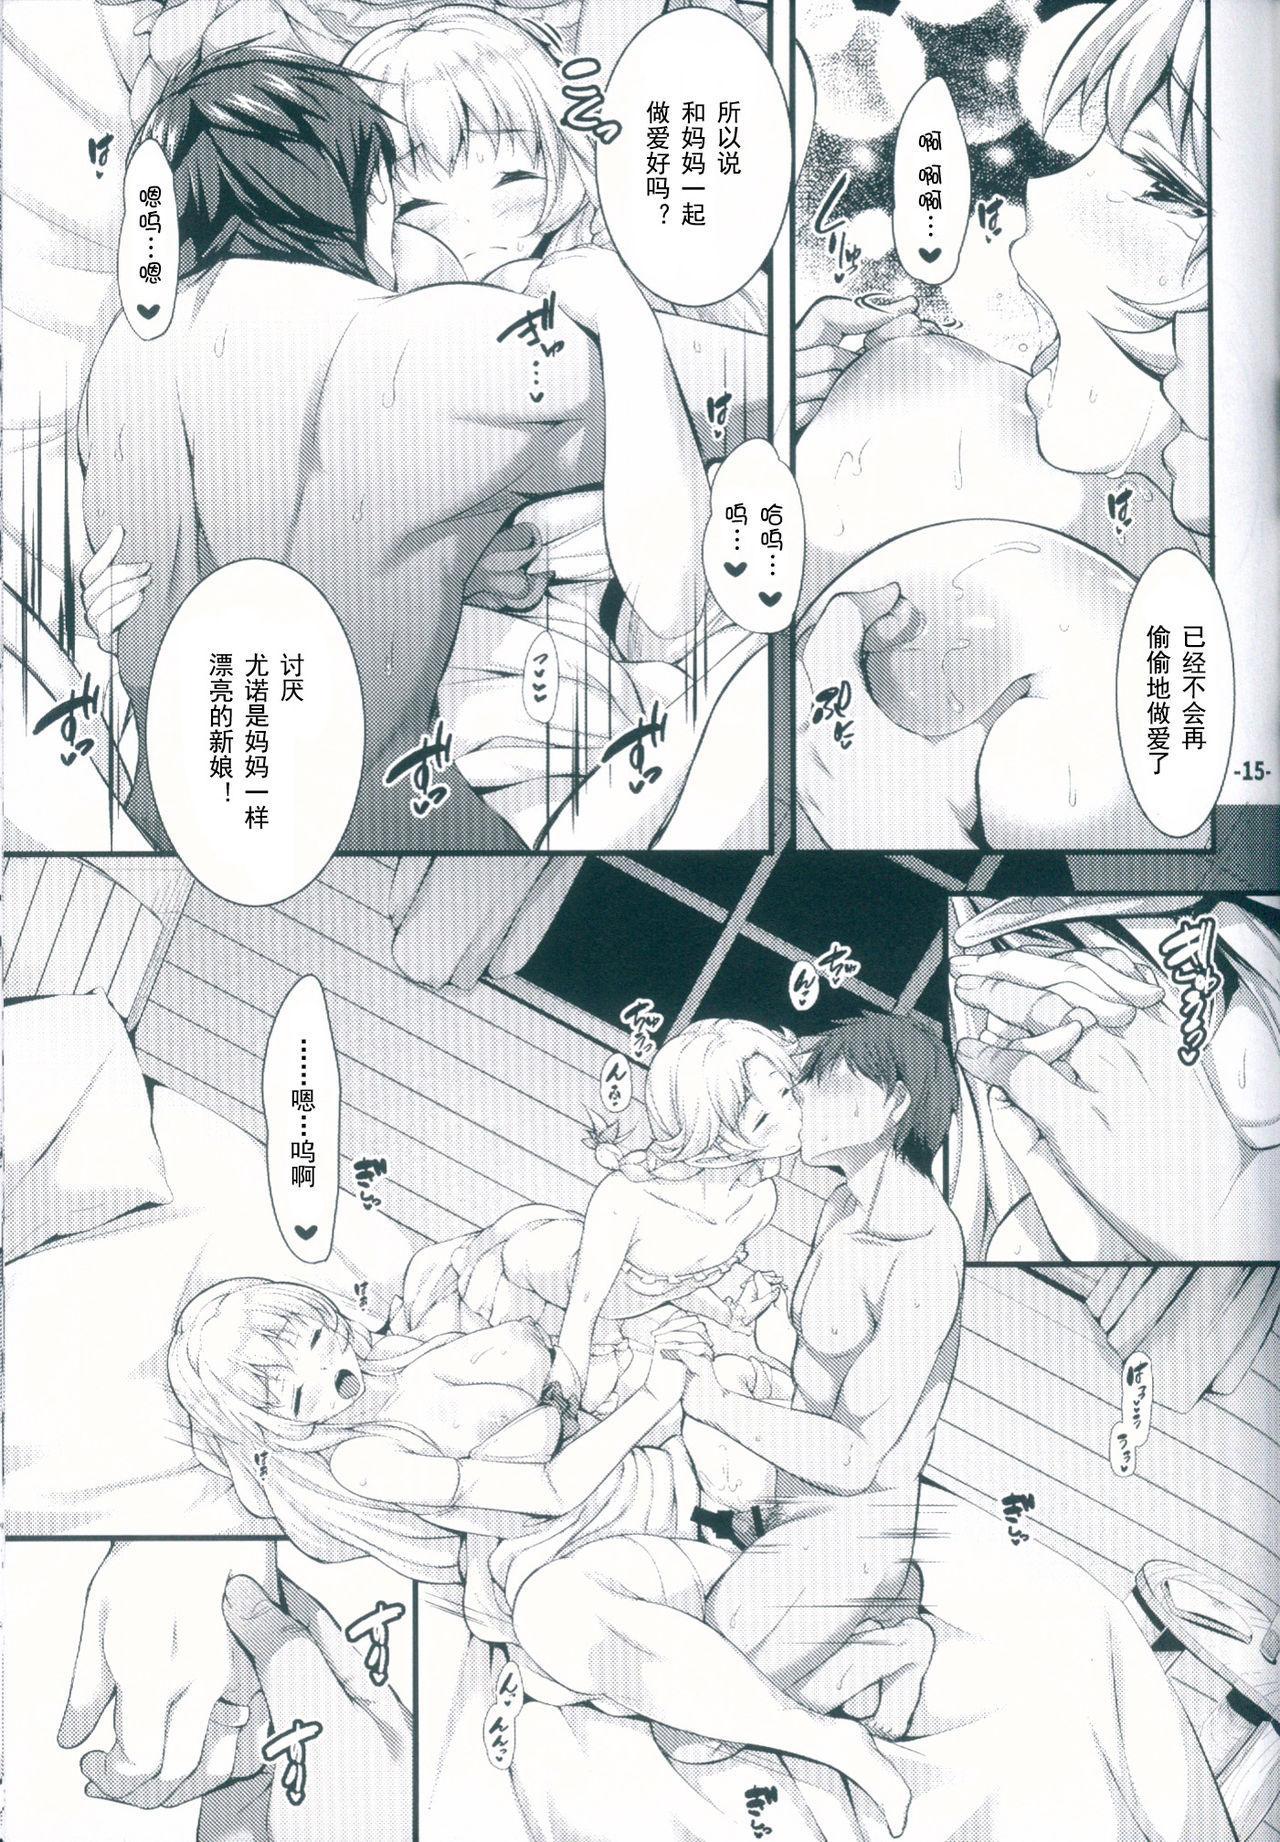 Isekai no Hanayome 15